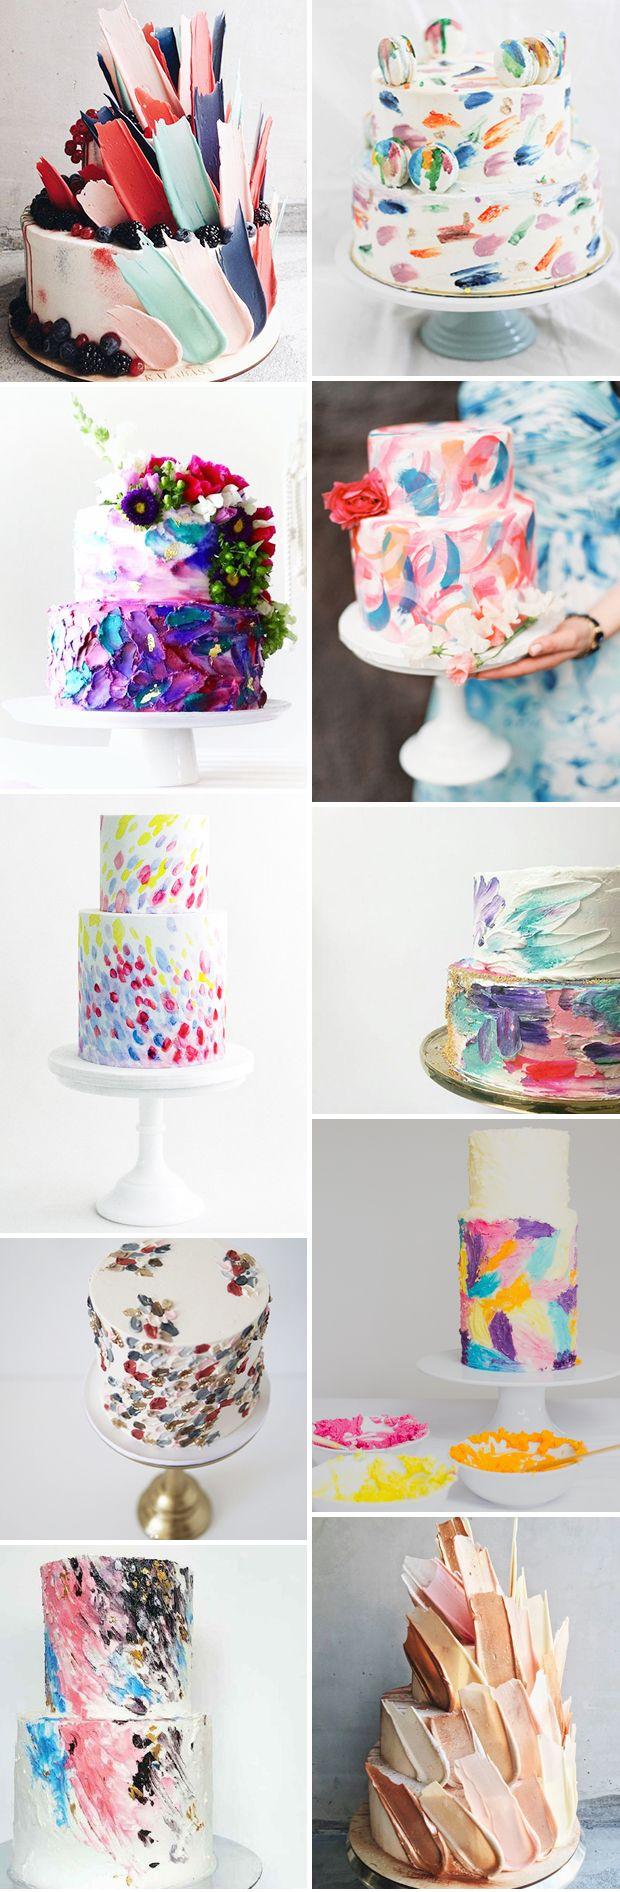 The Next Big Wedding Cake Trend: Brushstroke Cakes // www.onefabday.com